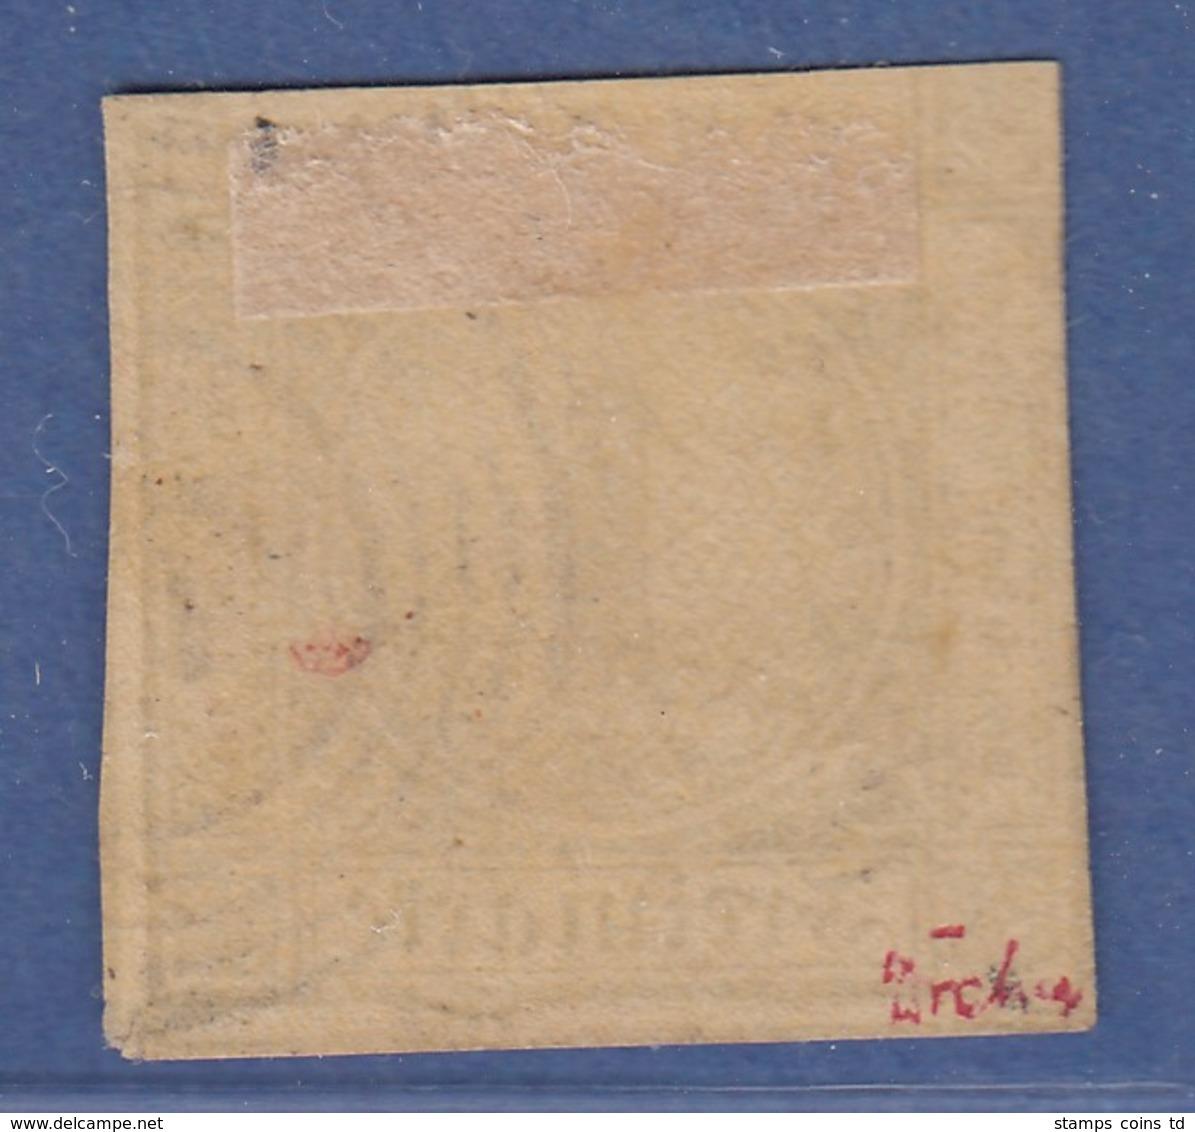 Altdeutschland Baden 1 Kreuzer Braun Mi.-Nr. 1b Gestempelt - Bade